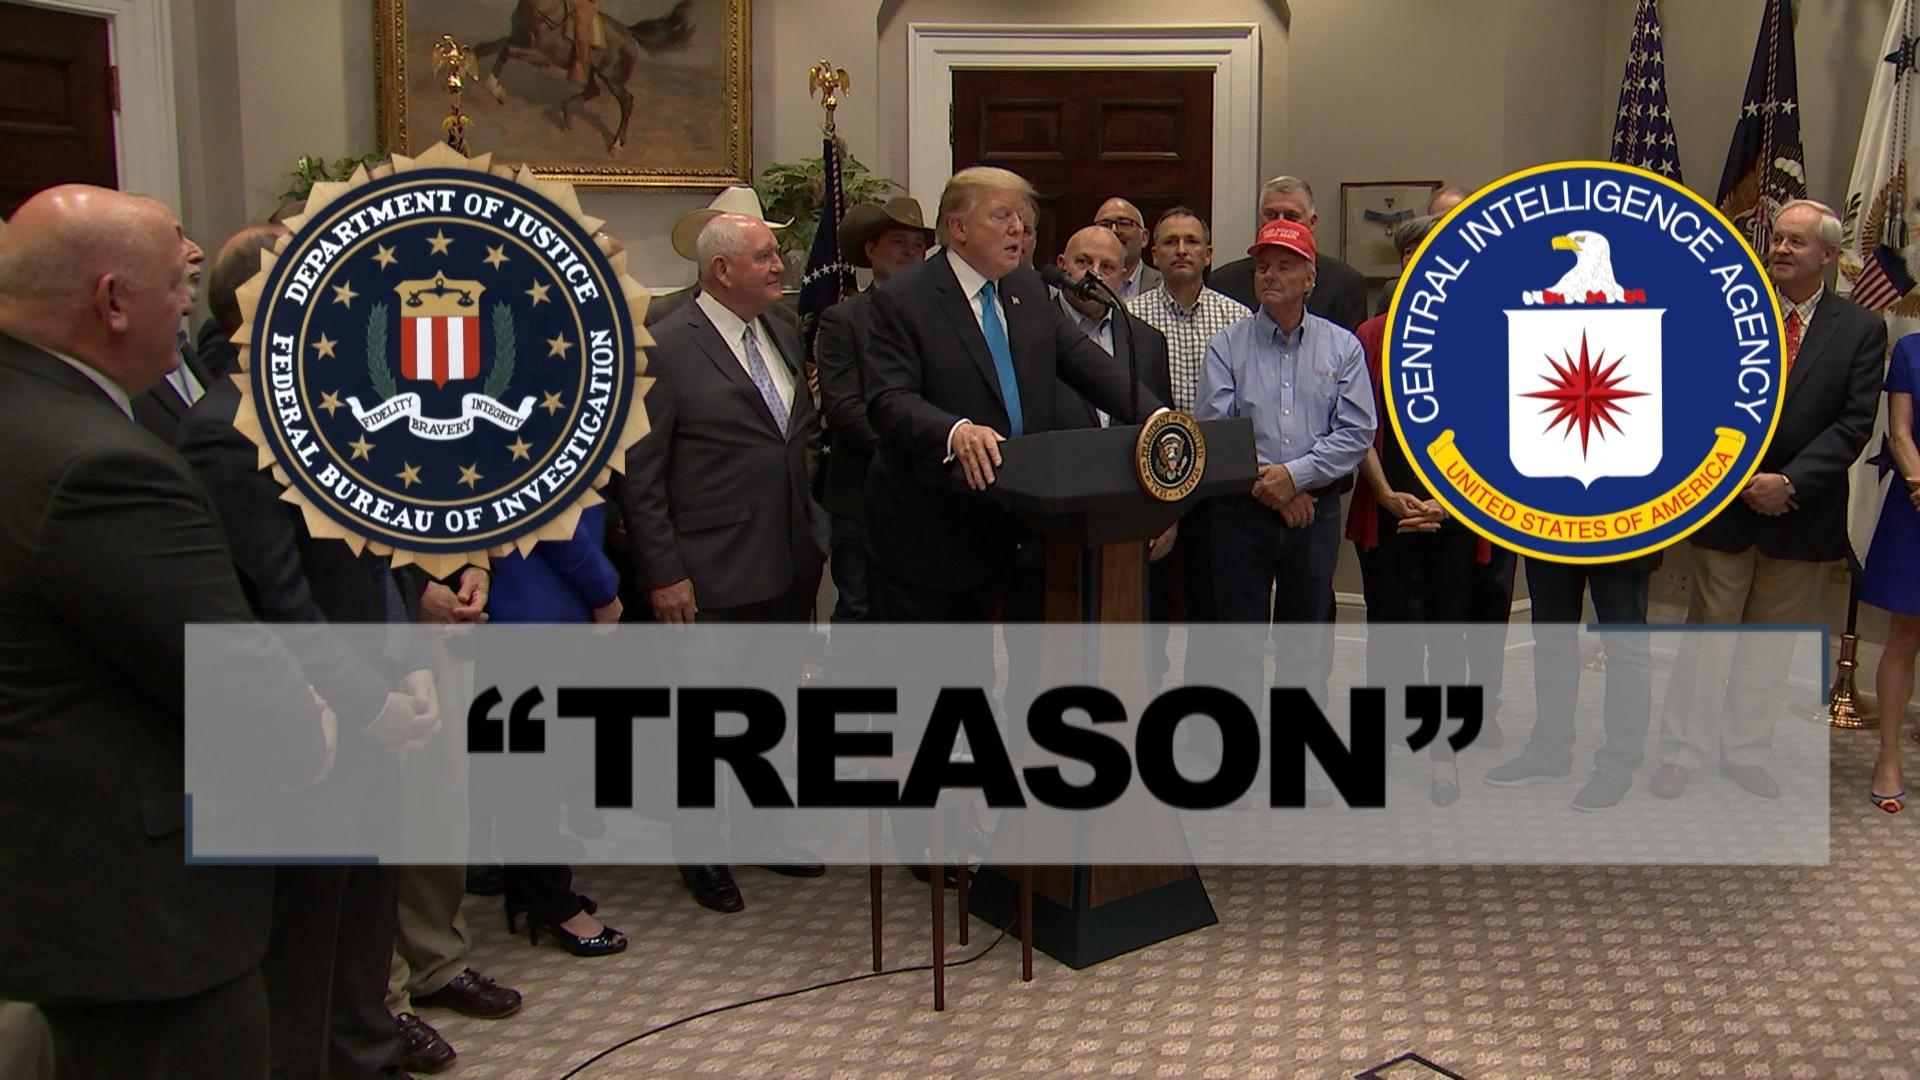 'Treason' and 'the big I-word' sidelines and divides Washington